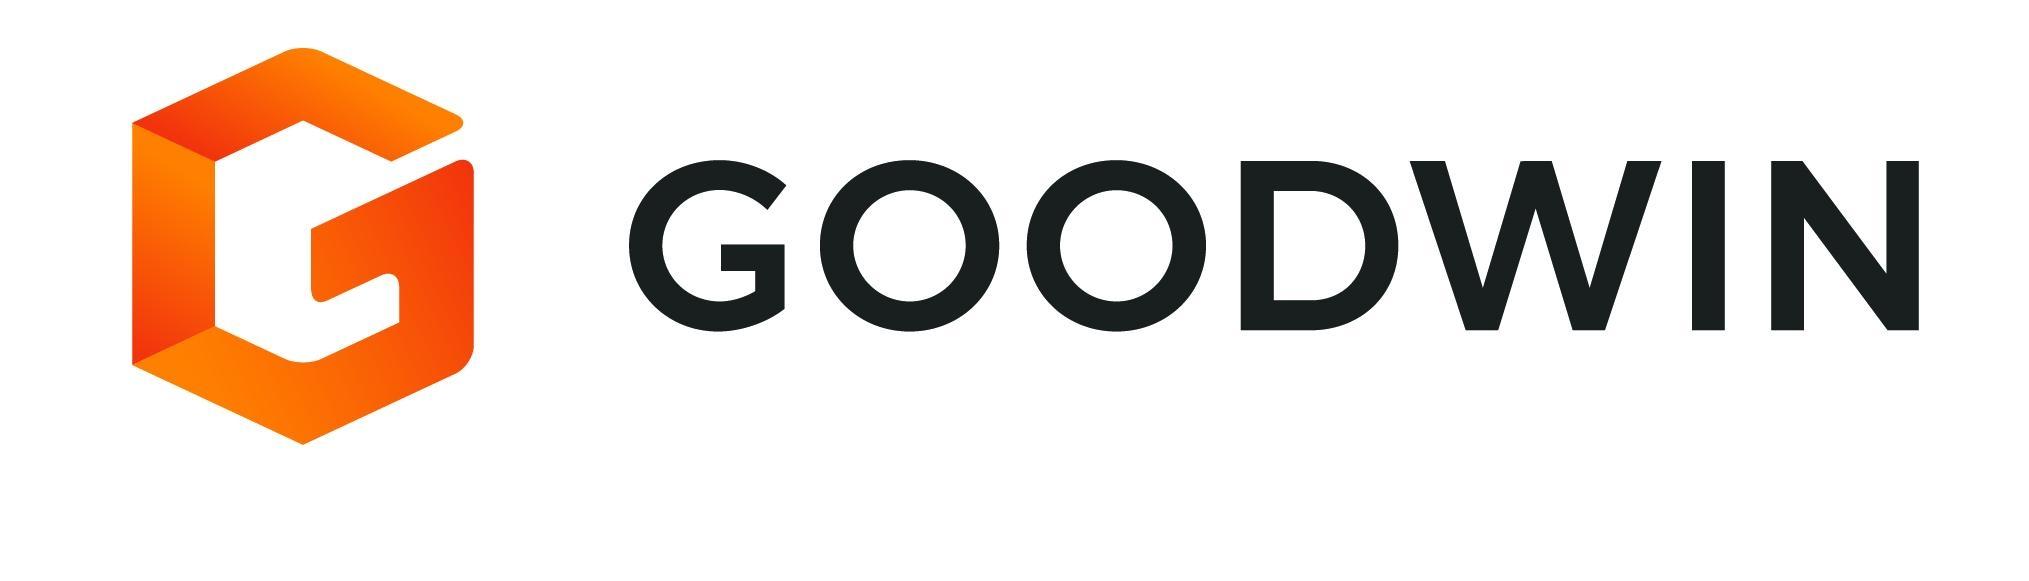 Goodwin JPG.jpg